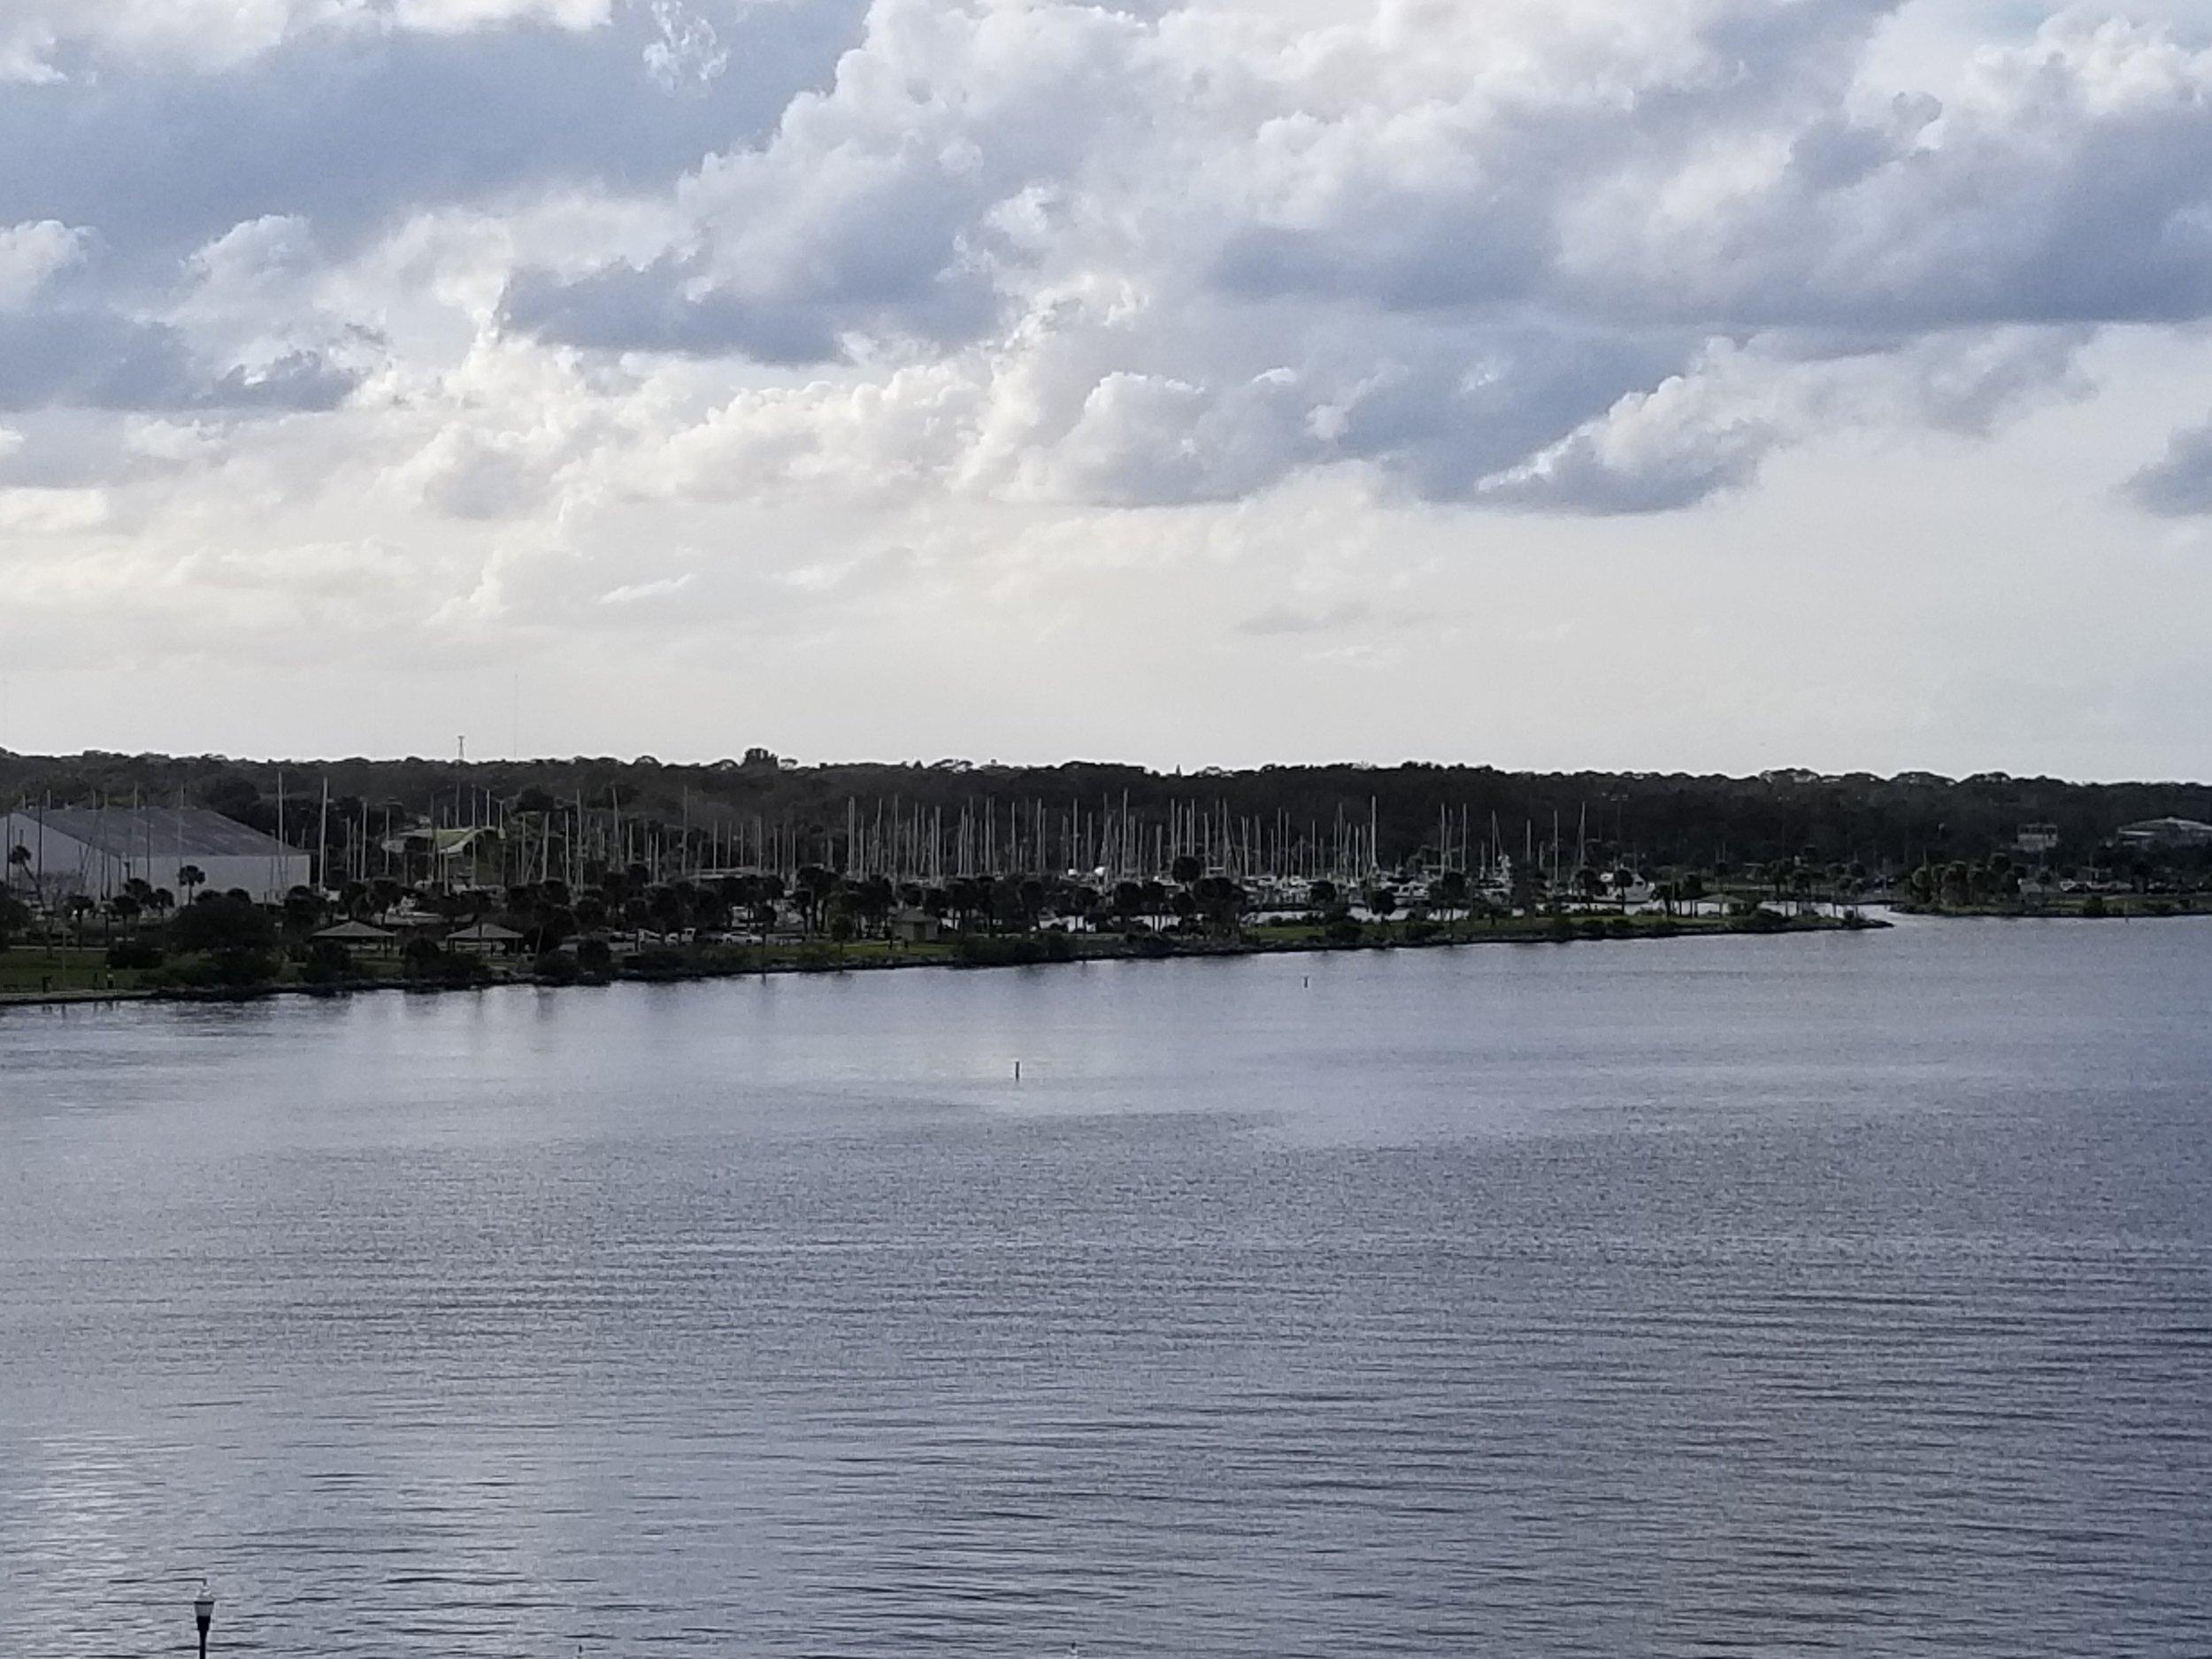 Titusville Marina and the adjacent Westland Marina.